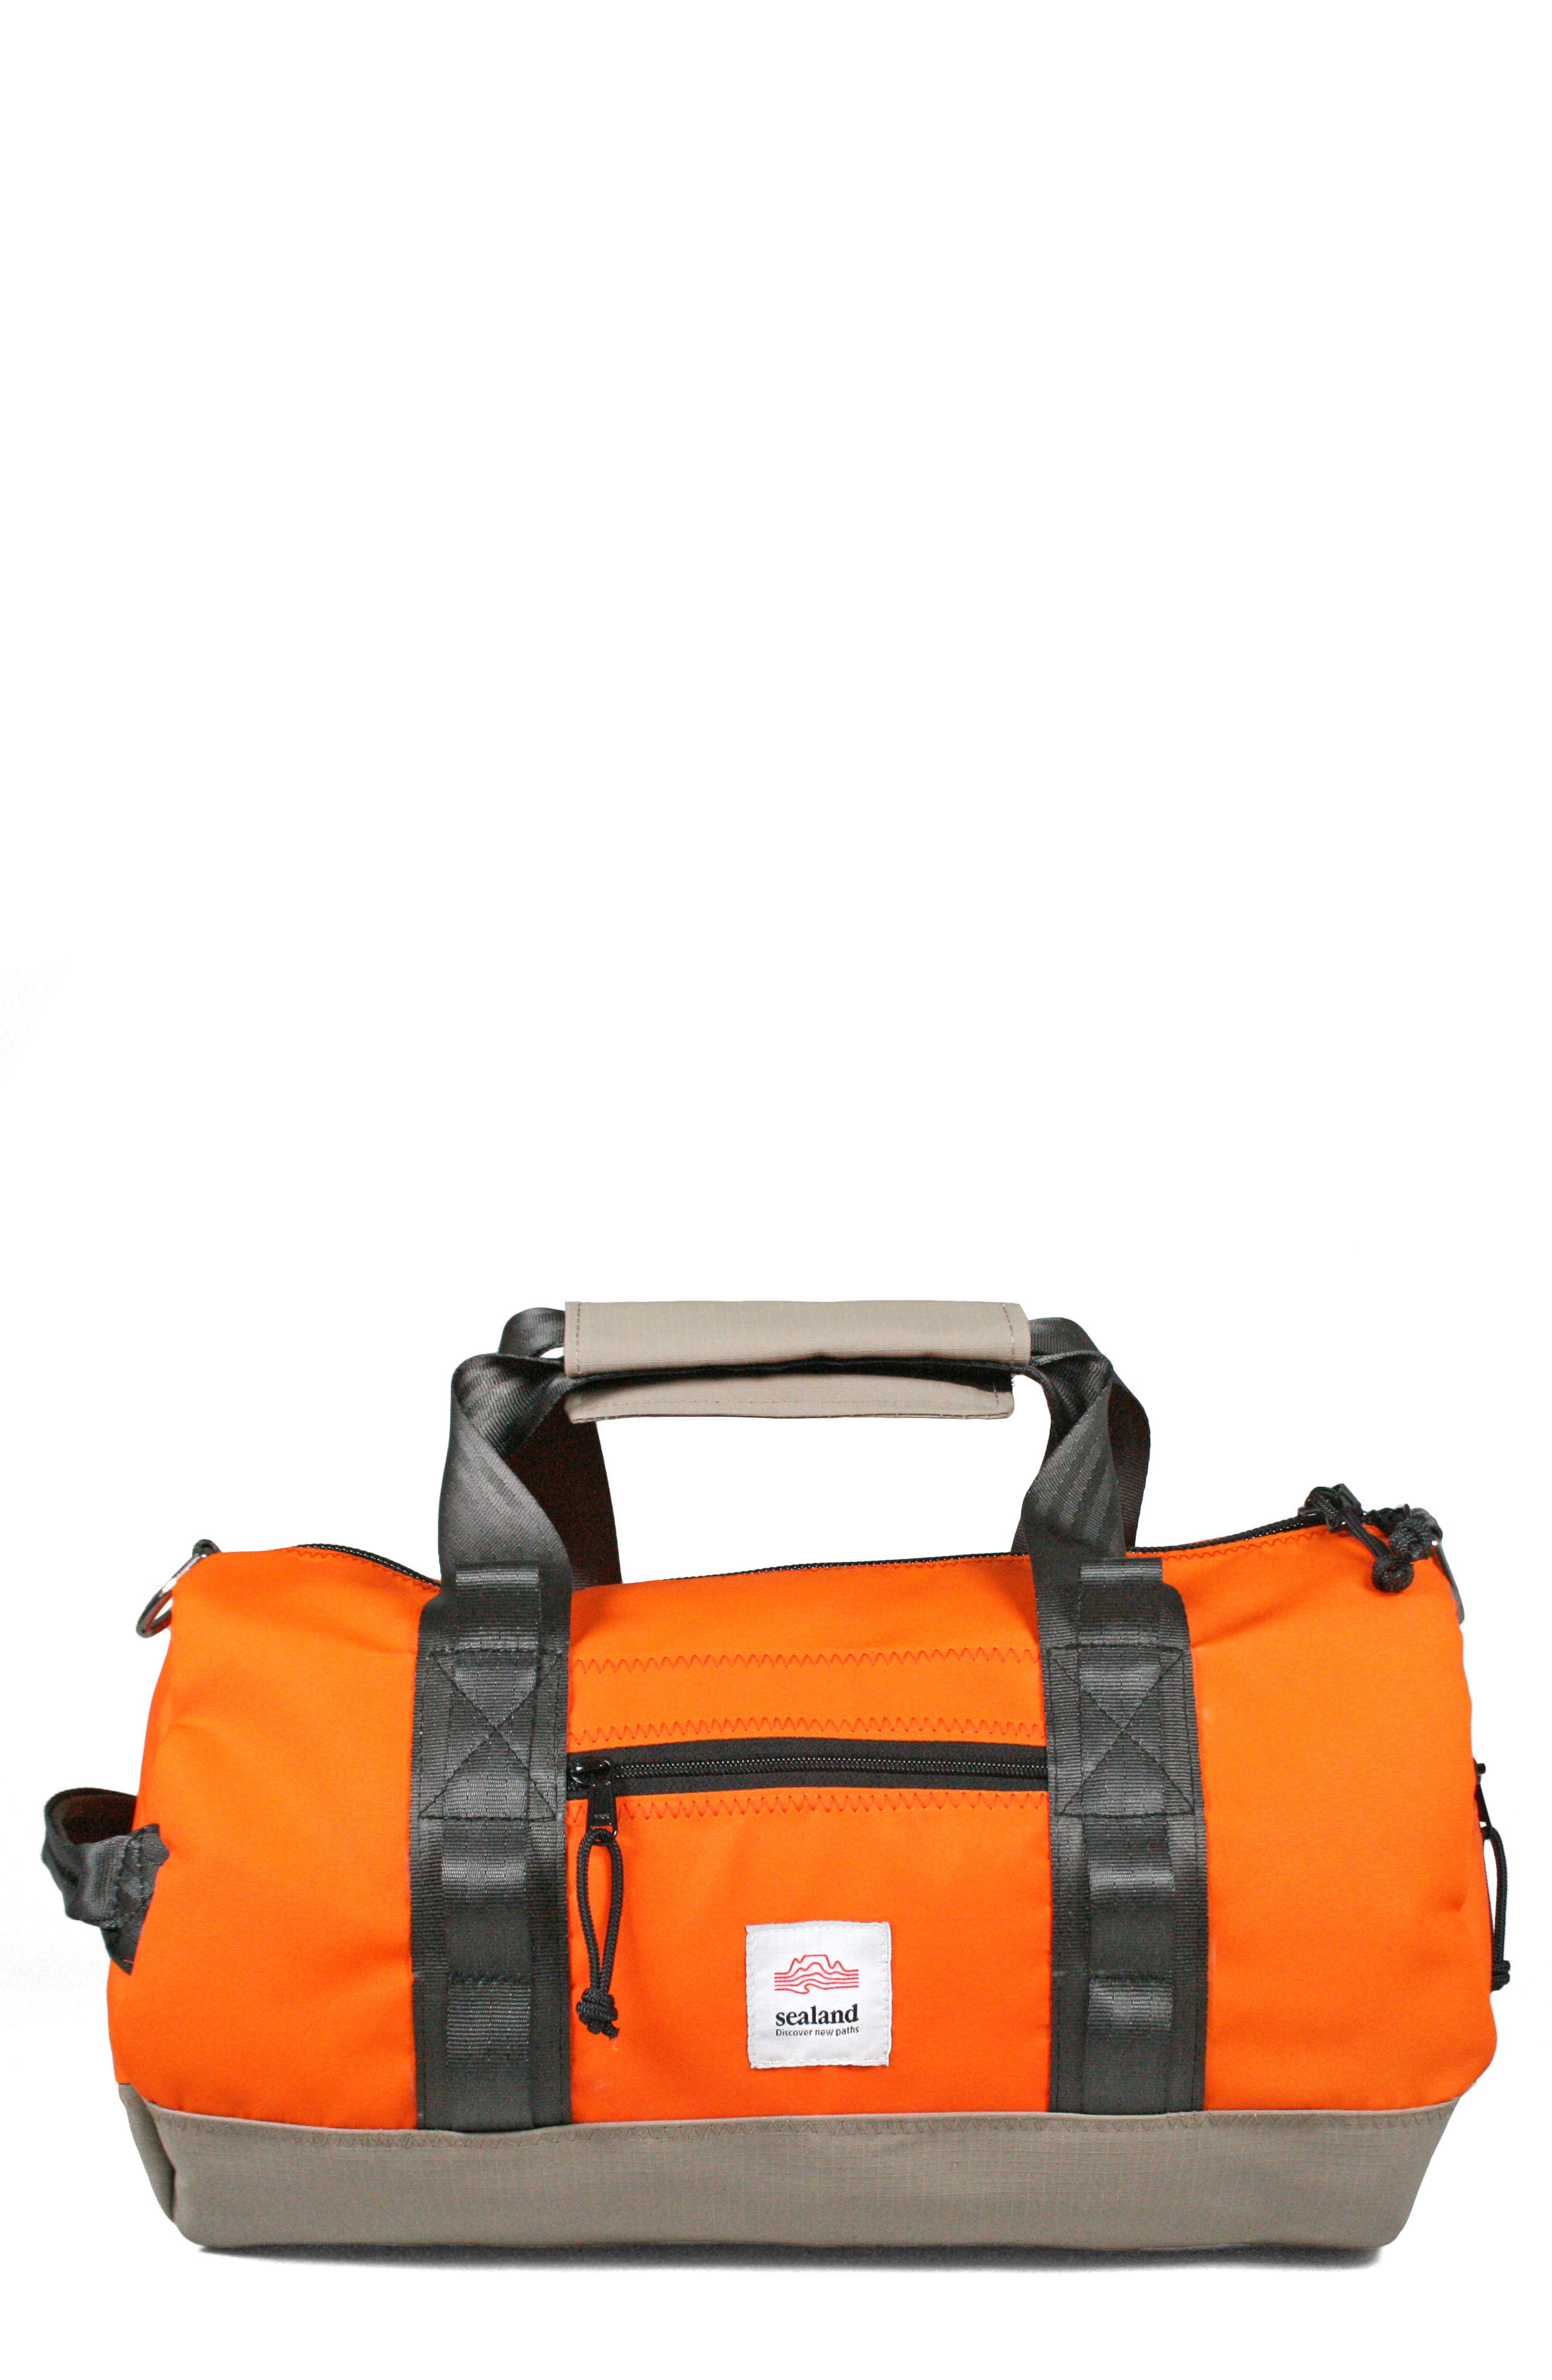 Choob S Duffle Bag